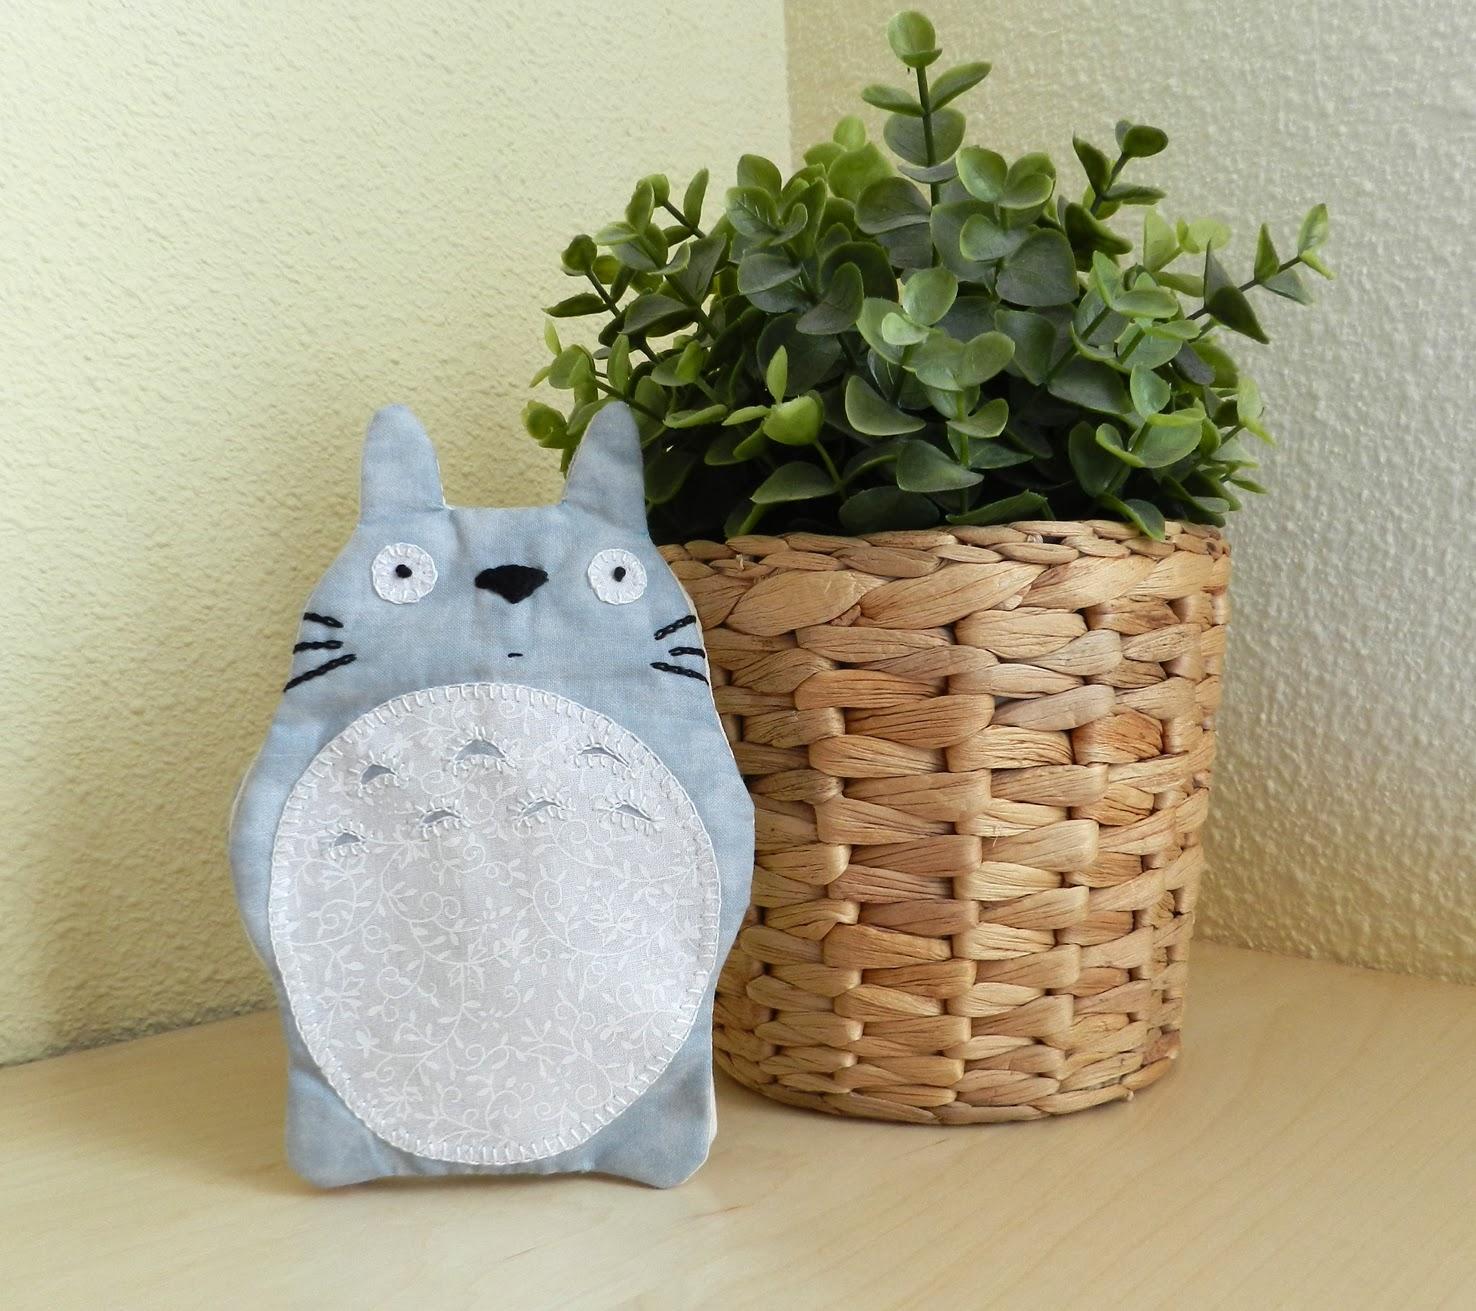 Funda móvil, smartphone, funda para smartphone, ipad, funda para el ipad,funda para el móvil, patchwork, Totoro, Funda para el móvil patchwork, Funda móvil Totoro, funda para el móvil de Totoro